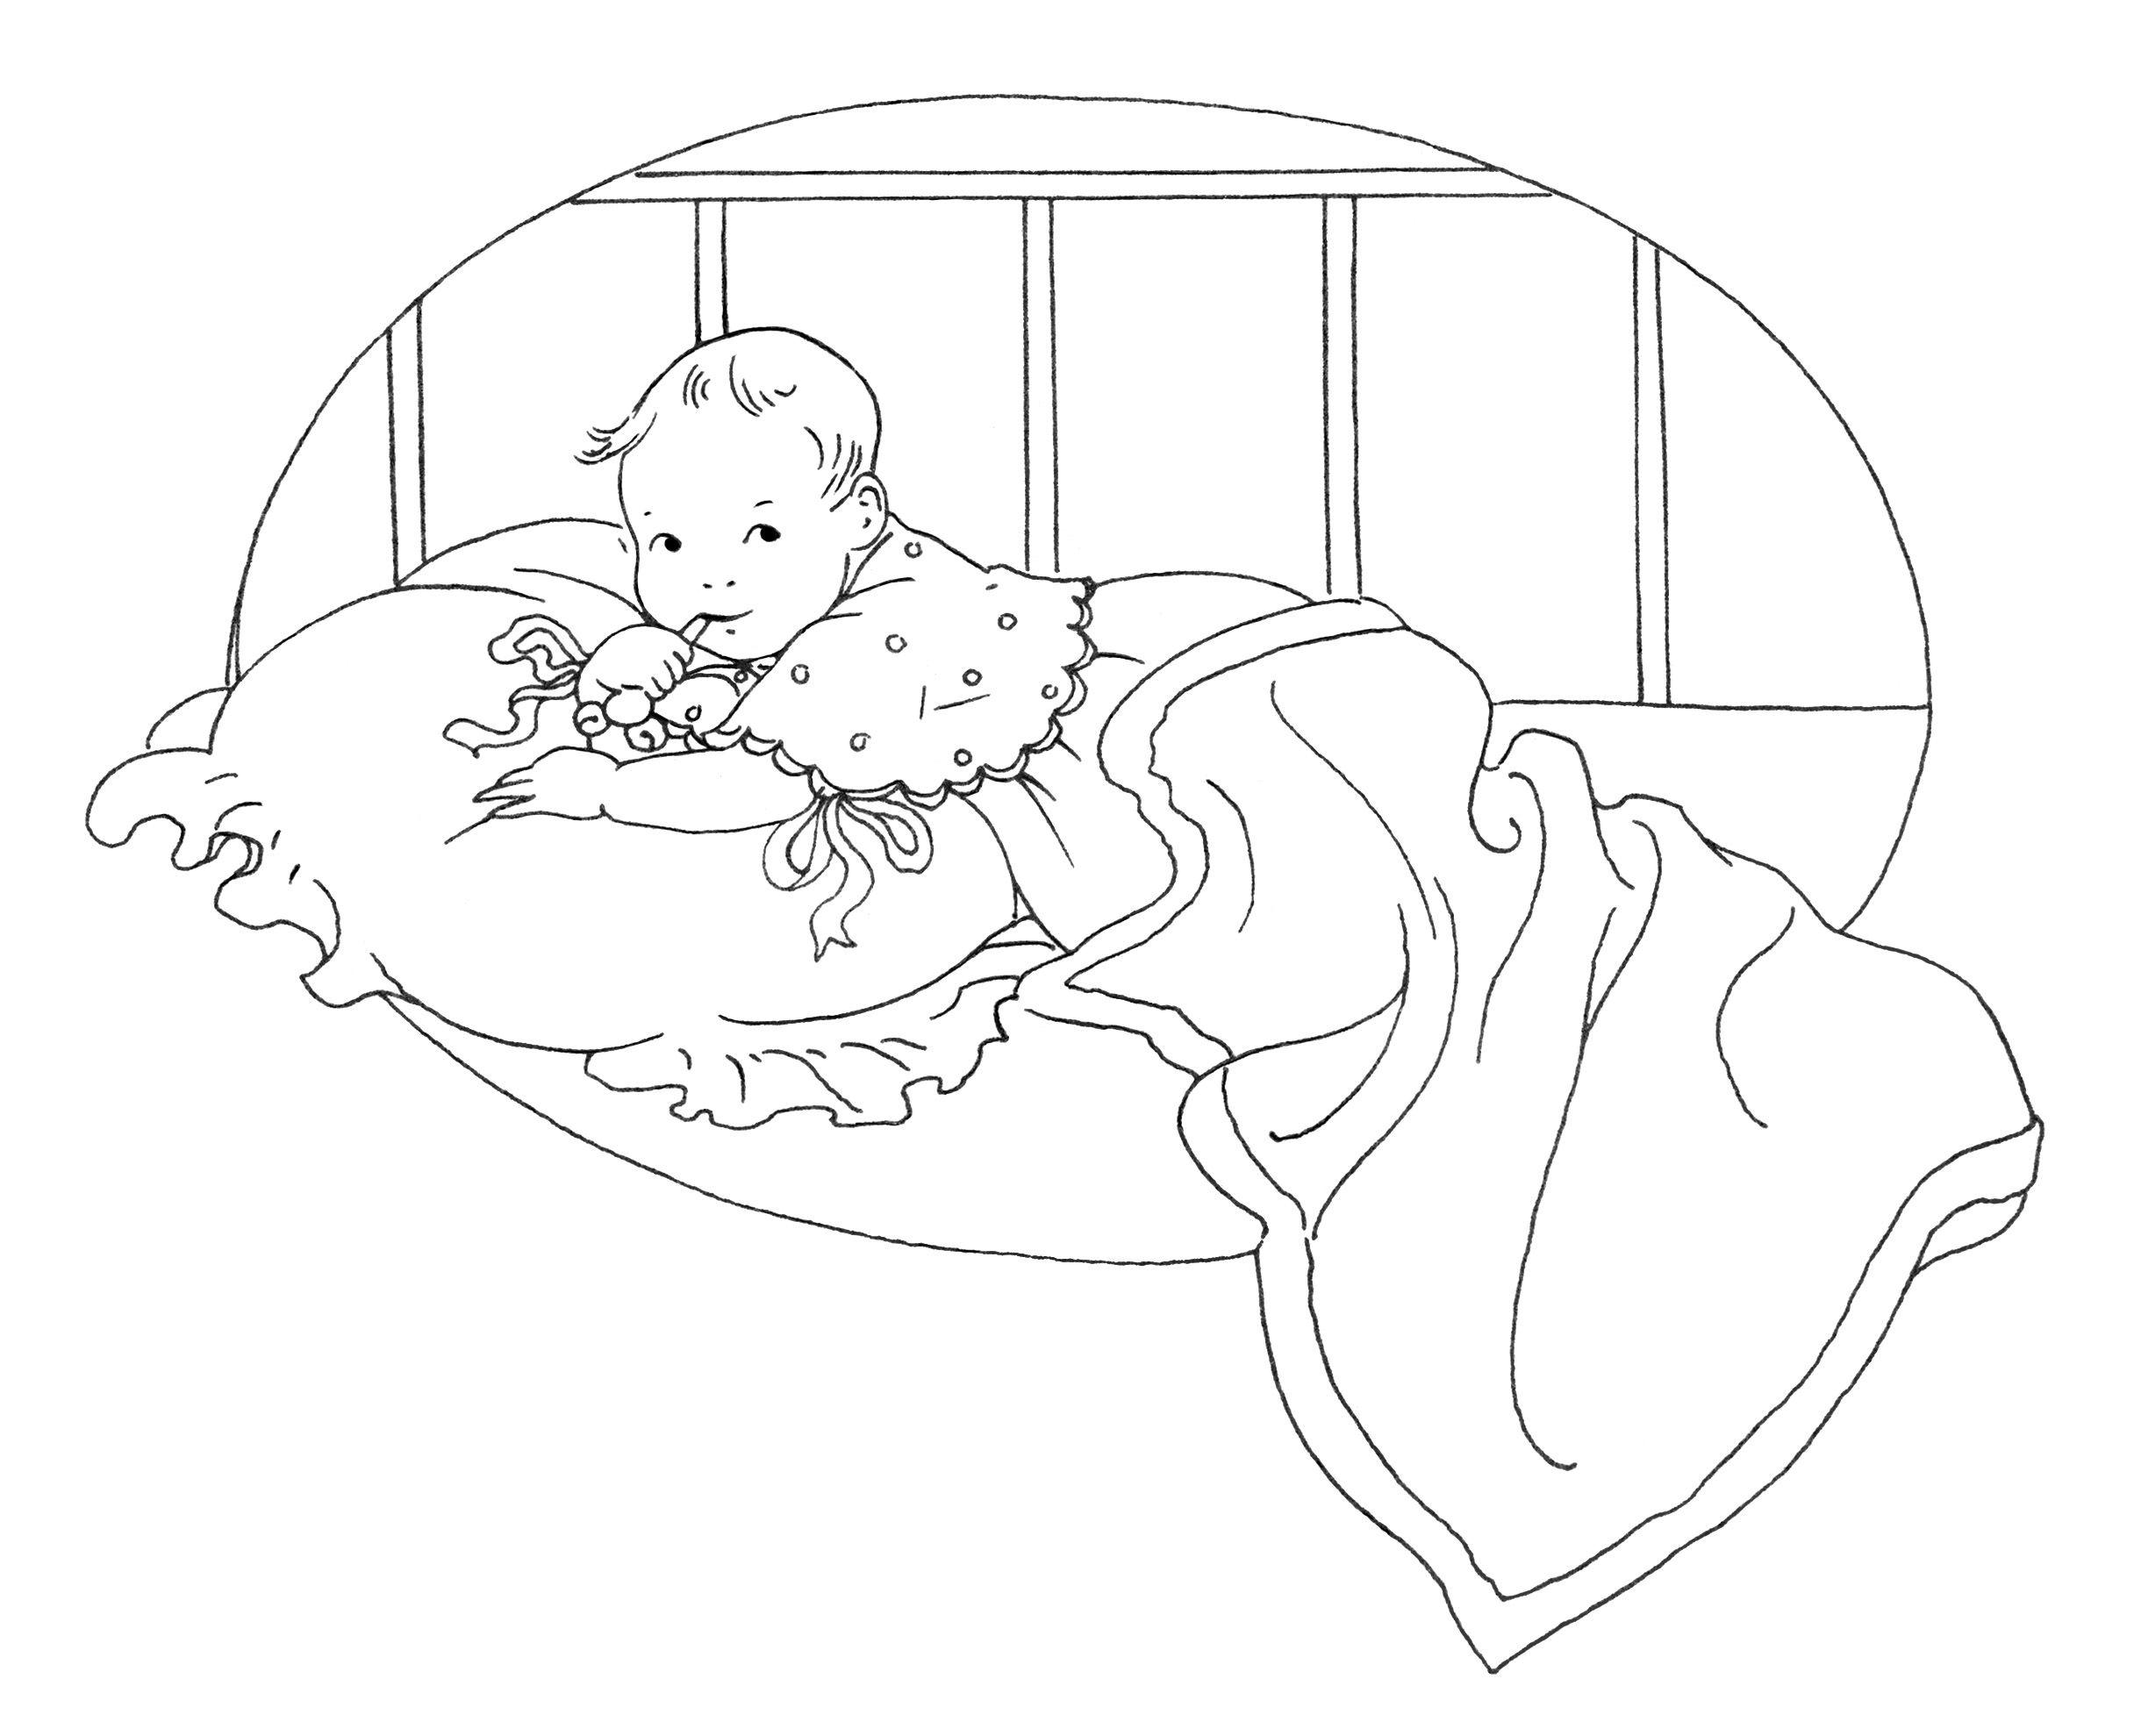 Olddesignshop Babysfirsttooth Jpg 2440 1979 Baby Clip Art Clip Art Vintage Vintage Drawing